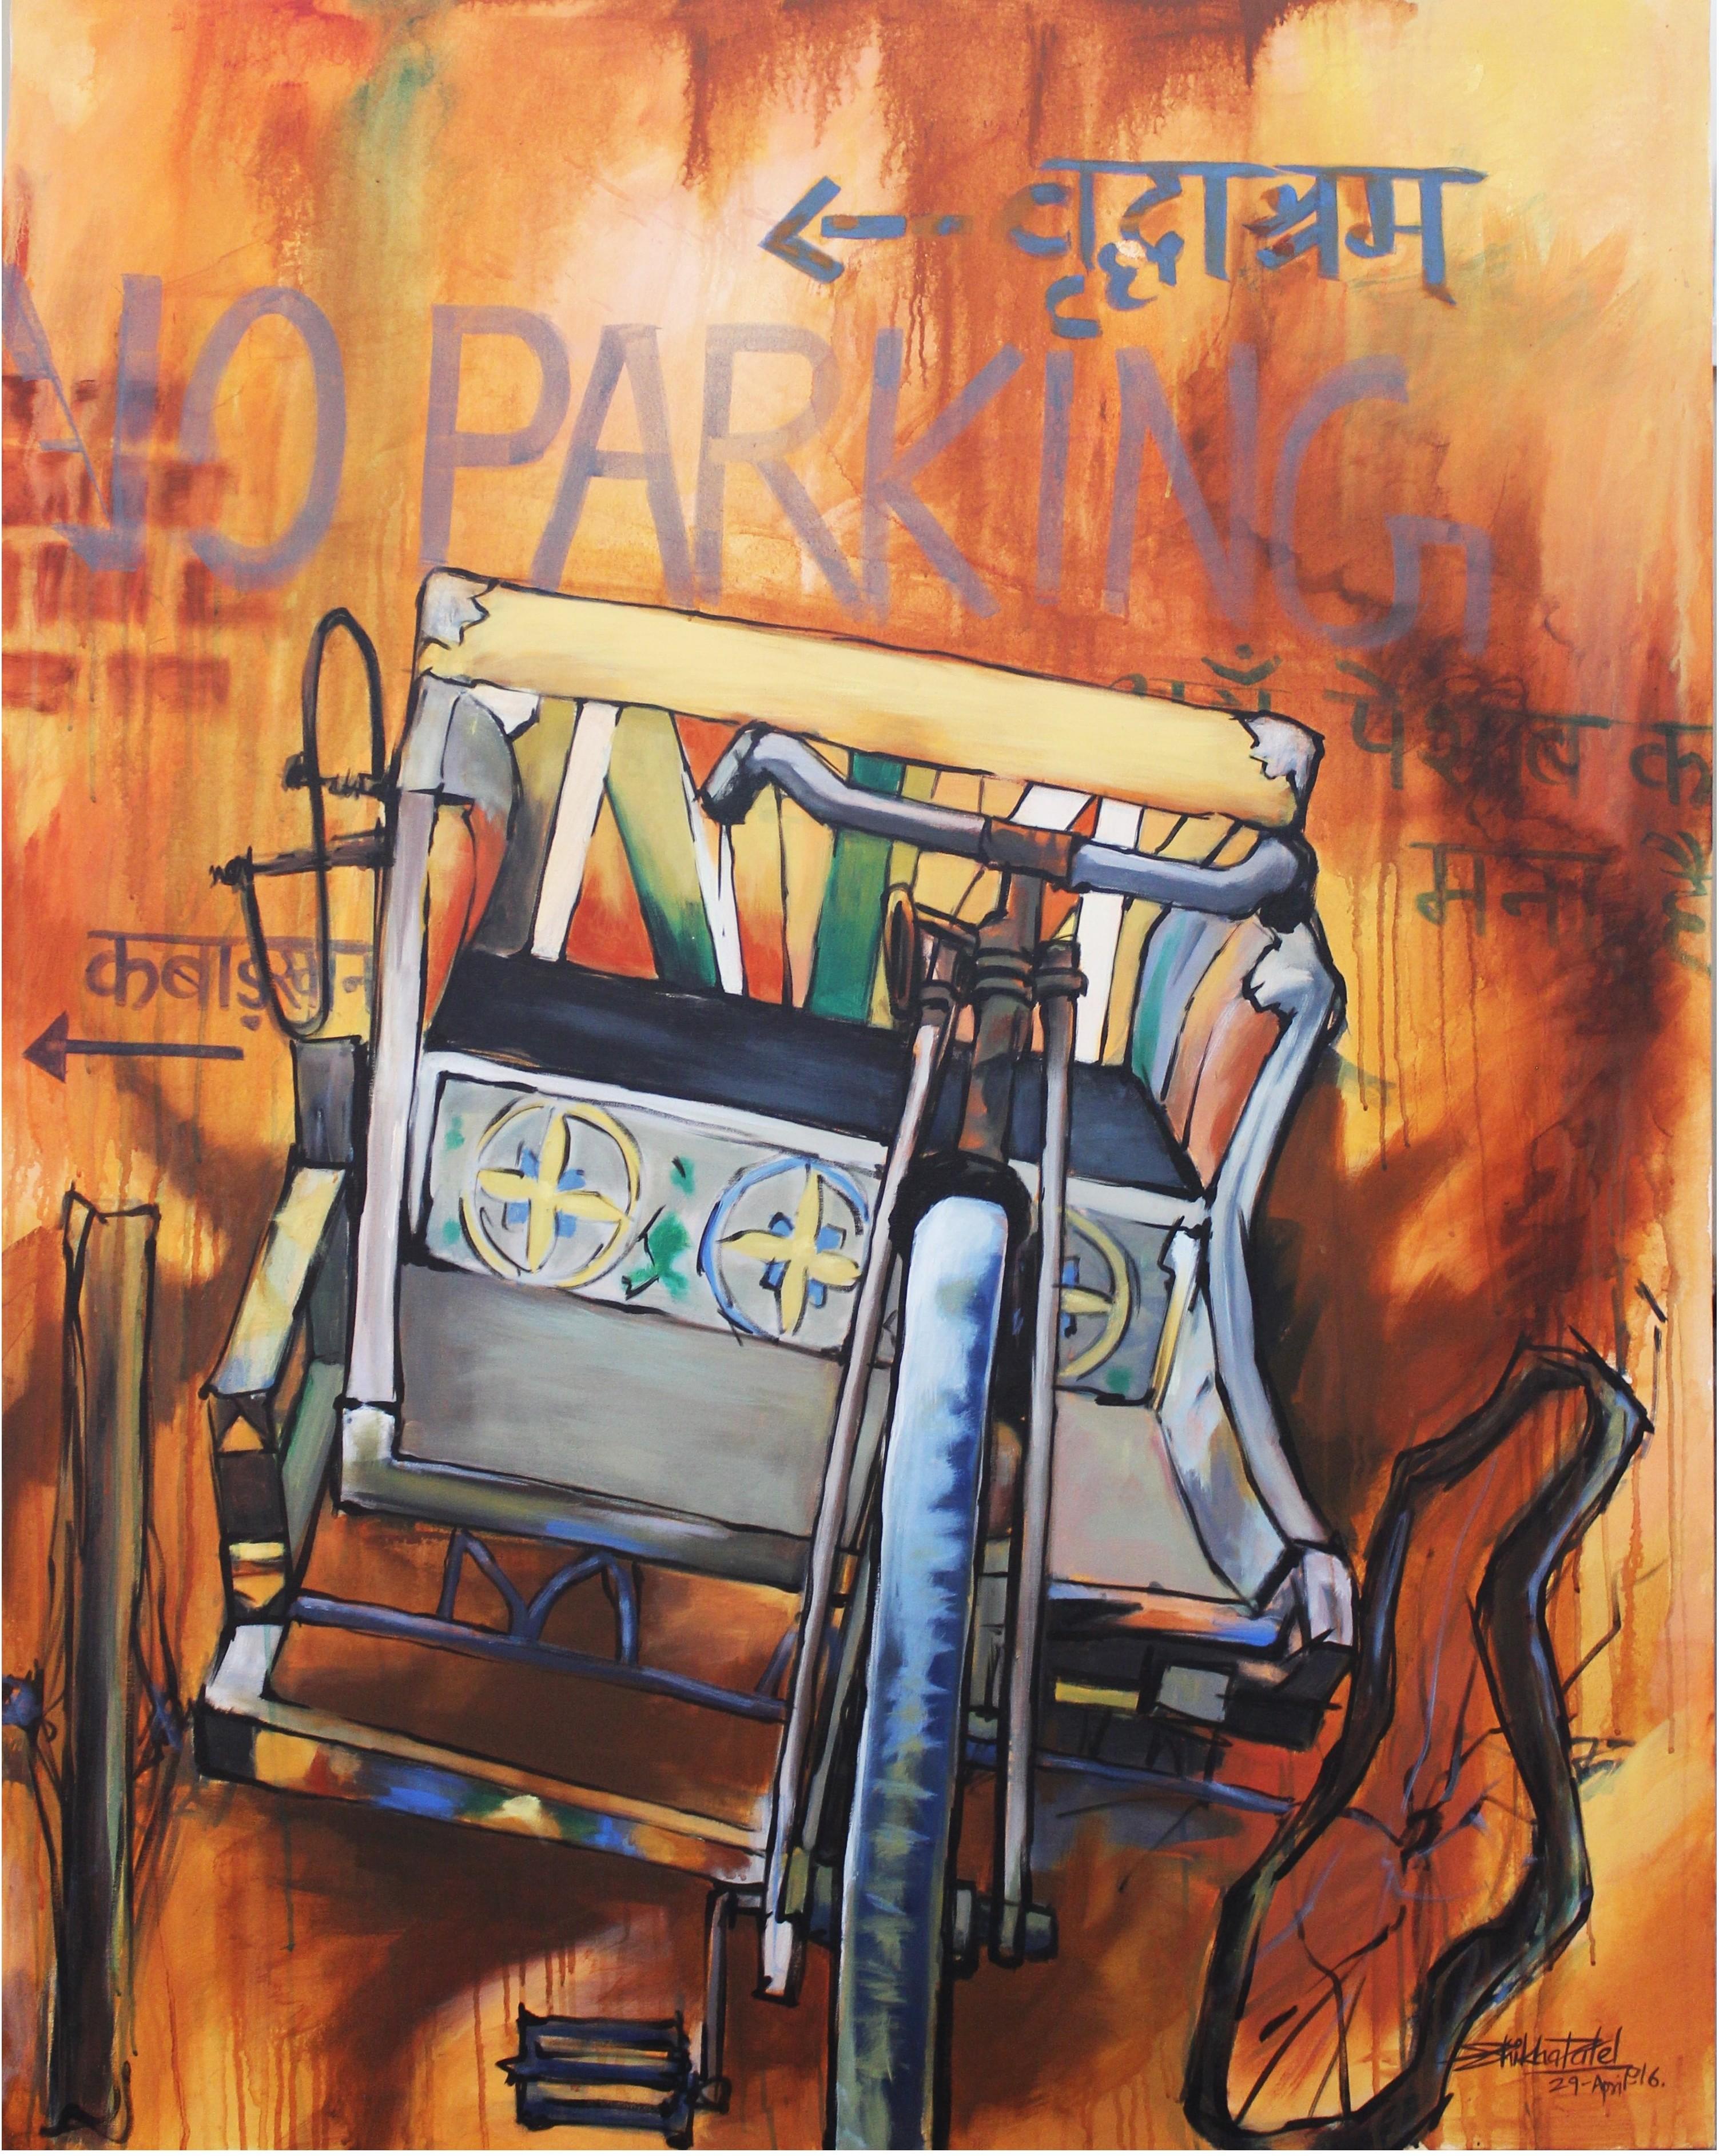 consequenceof aging rickshaw